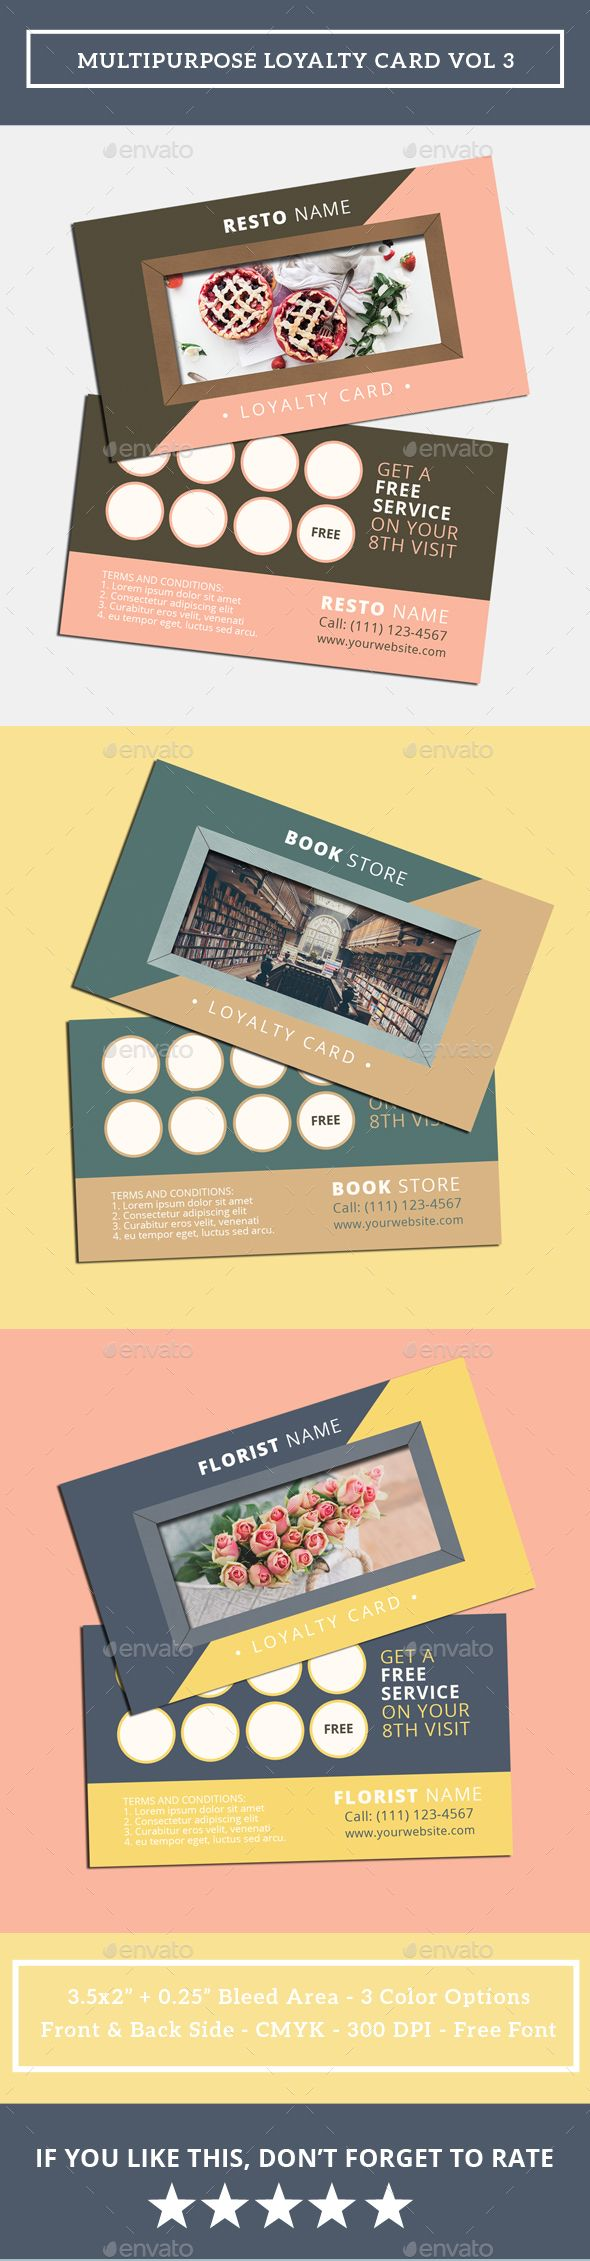 Best 25+ Loyalty card design ideas on Pinterest   Esthetician ...